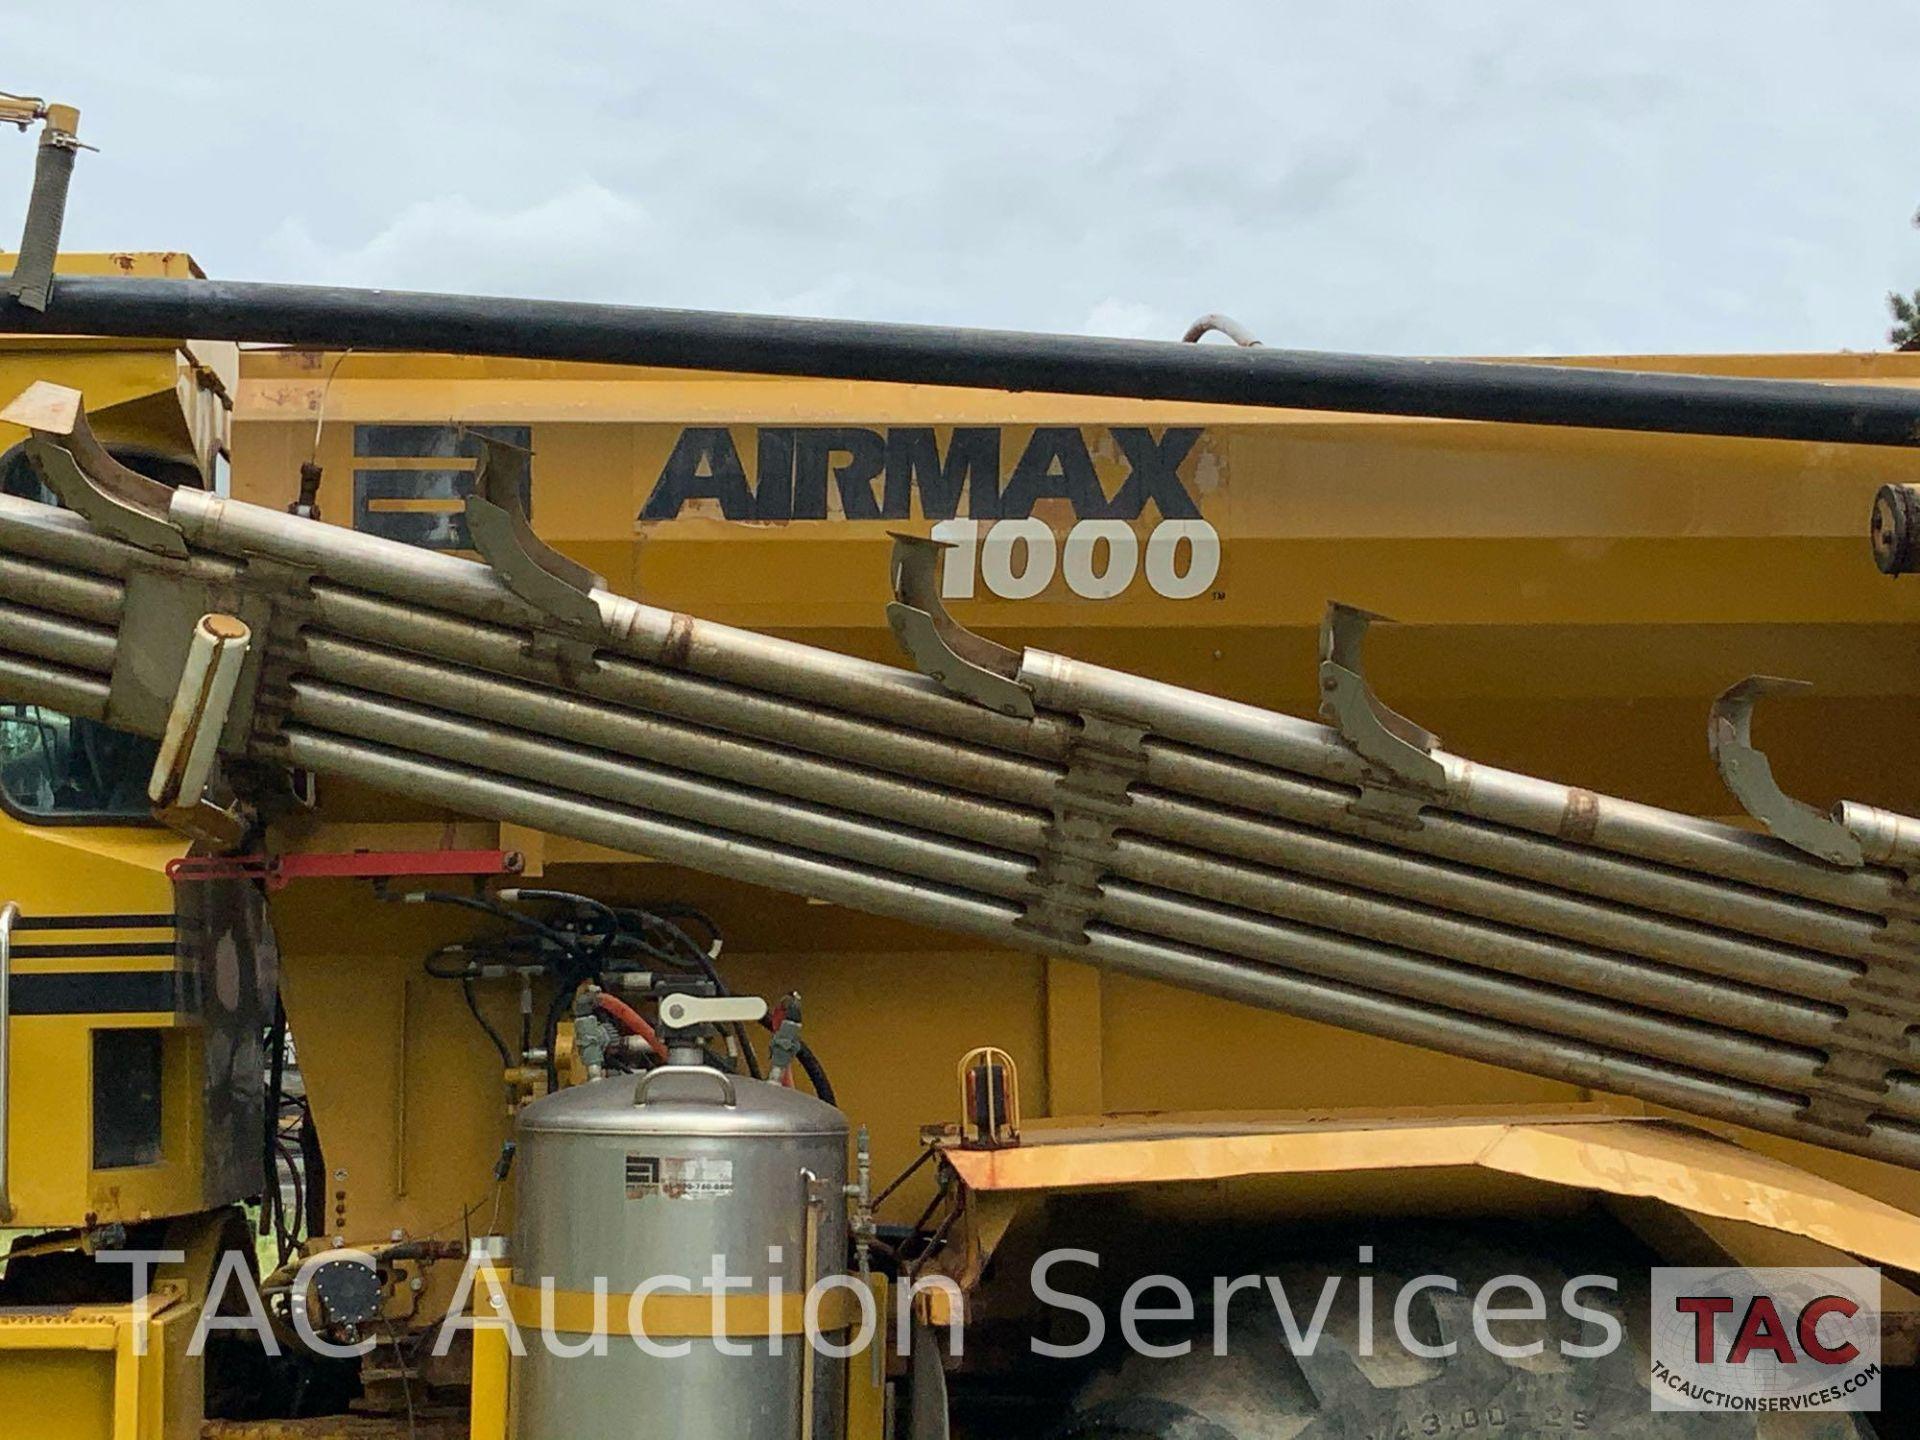 AirMax 1000 Dry Fertilizer Spreader - Image 10 of 30